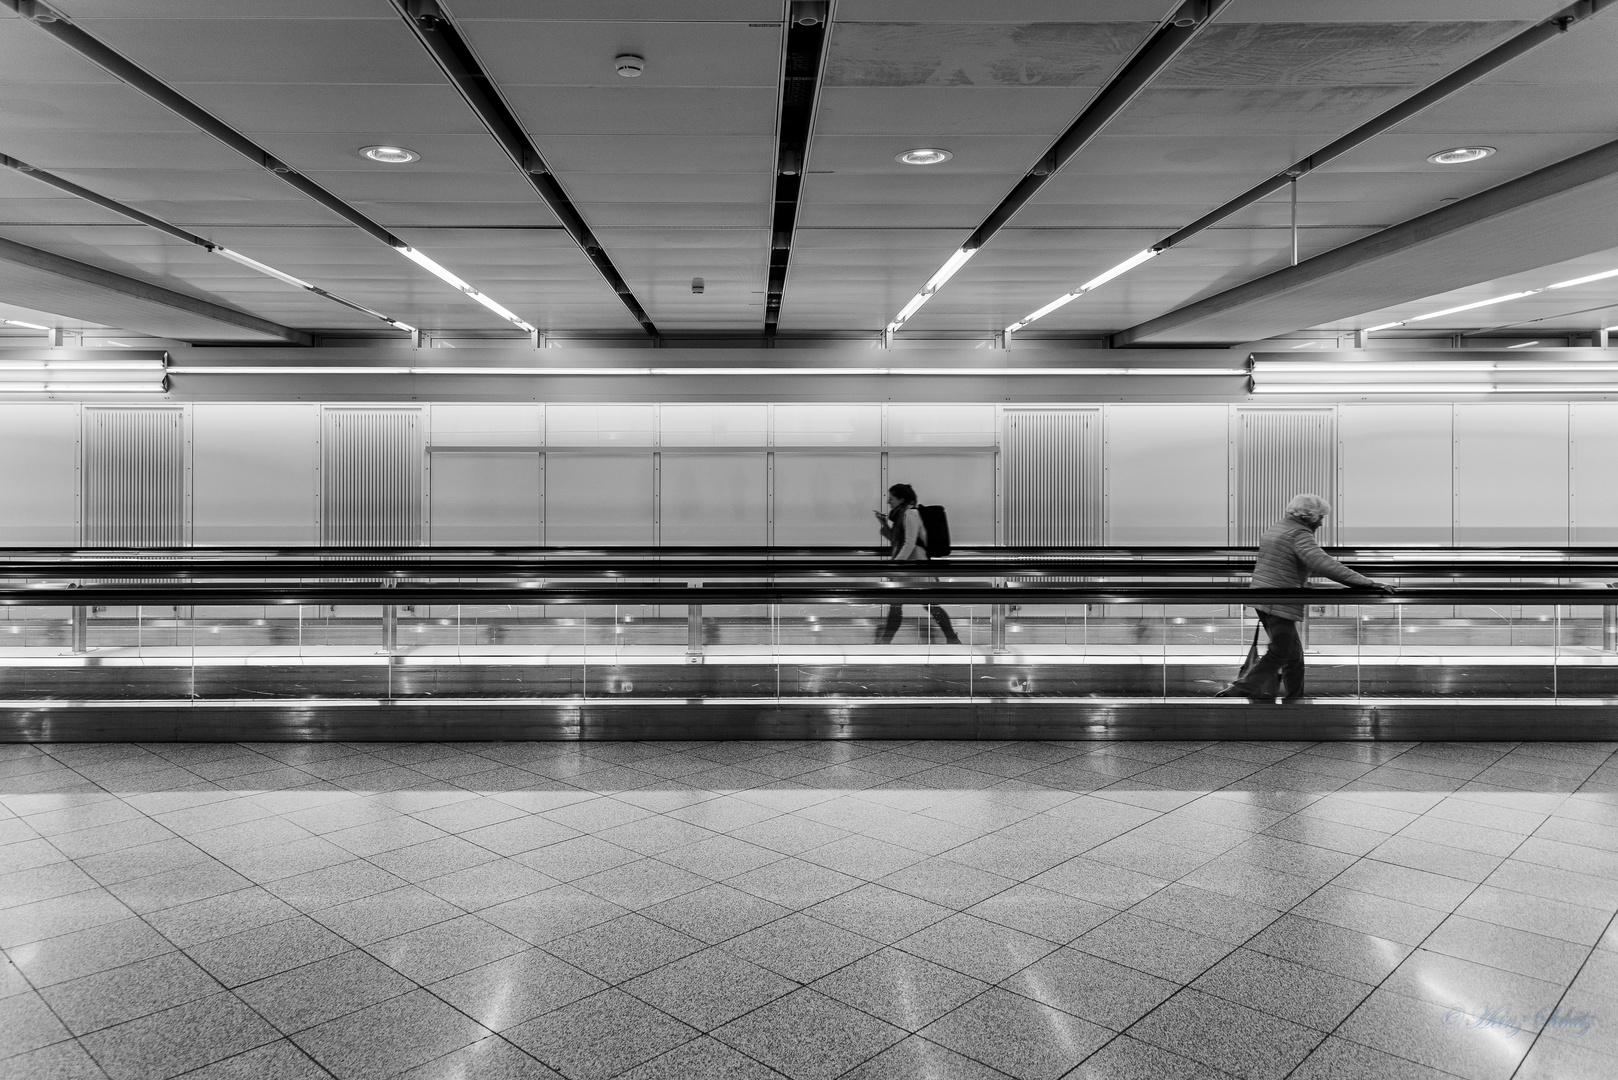 D&C_Modernes_Leben-8908